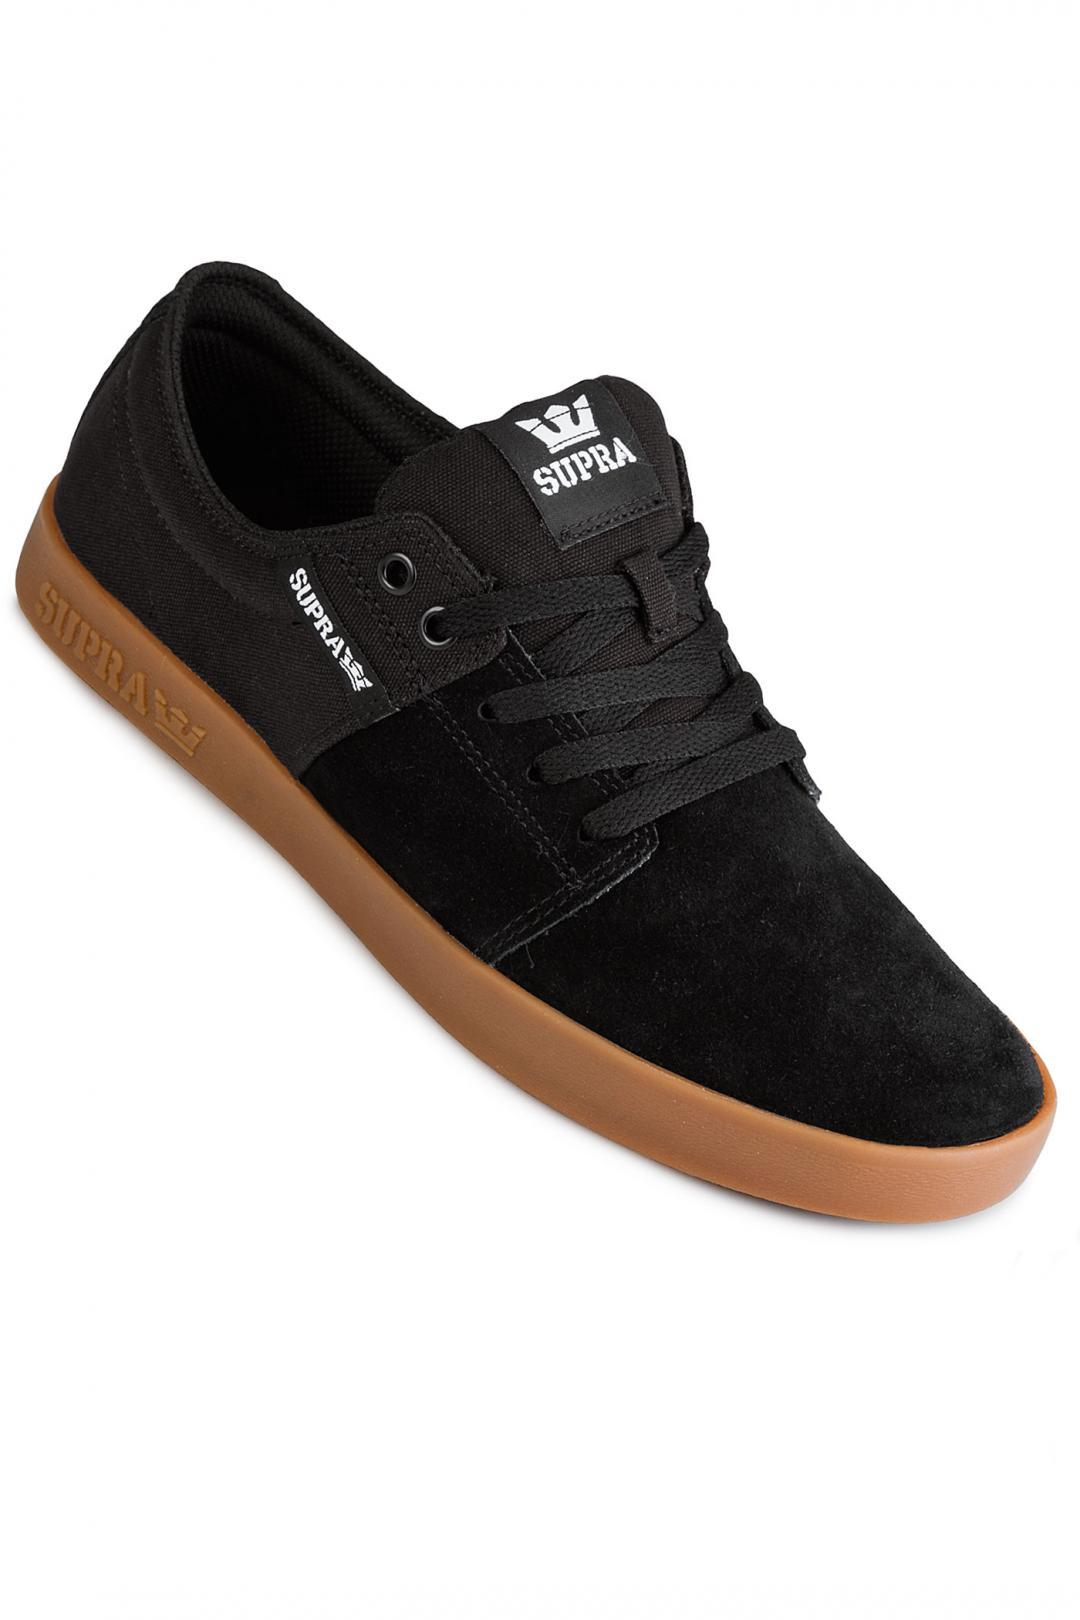 Uomo Supra Stacks II black gum 2 | Sneaker